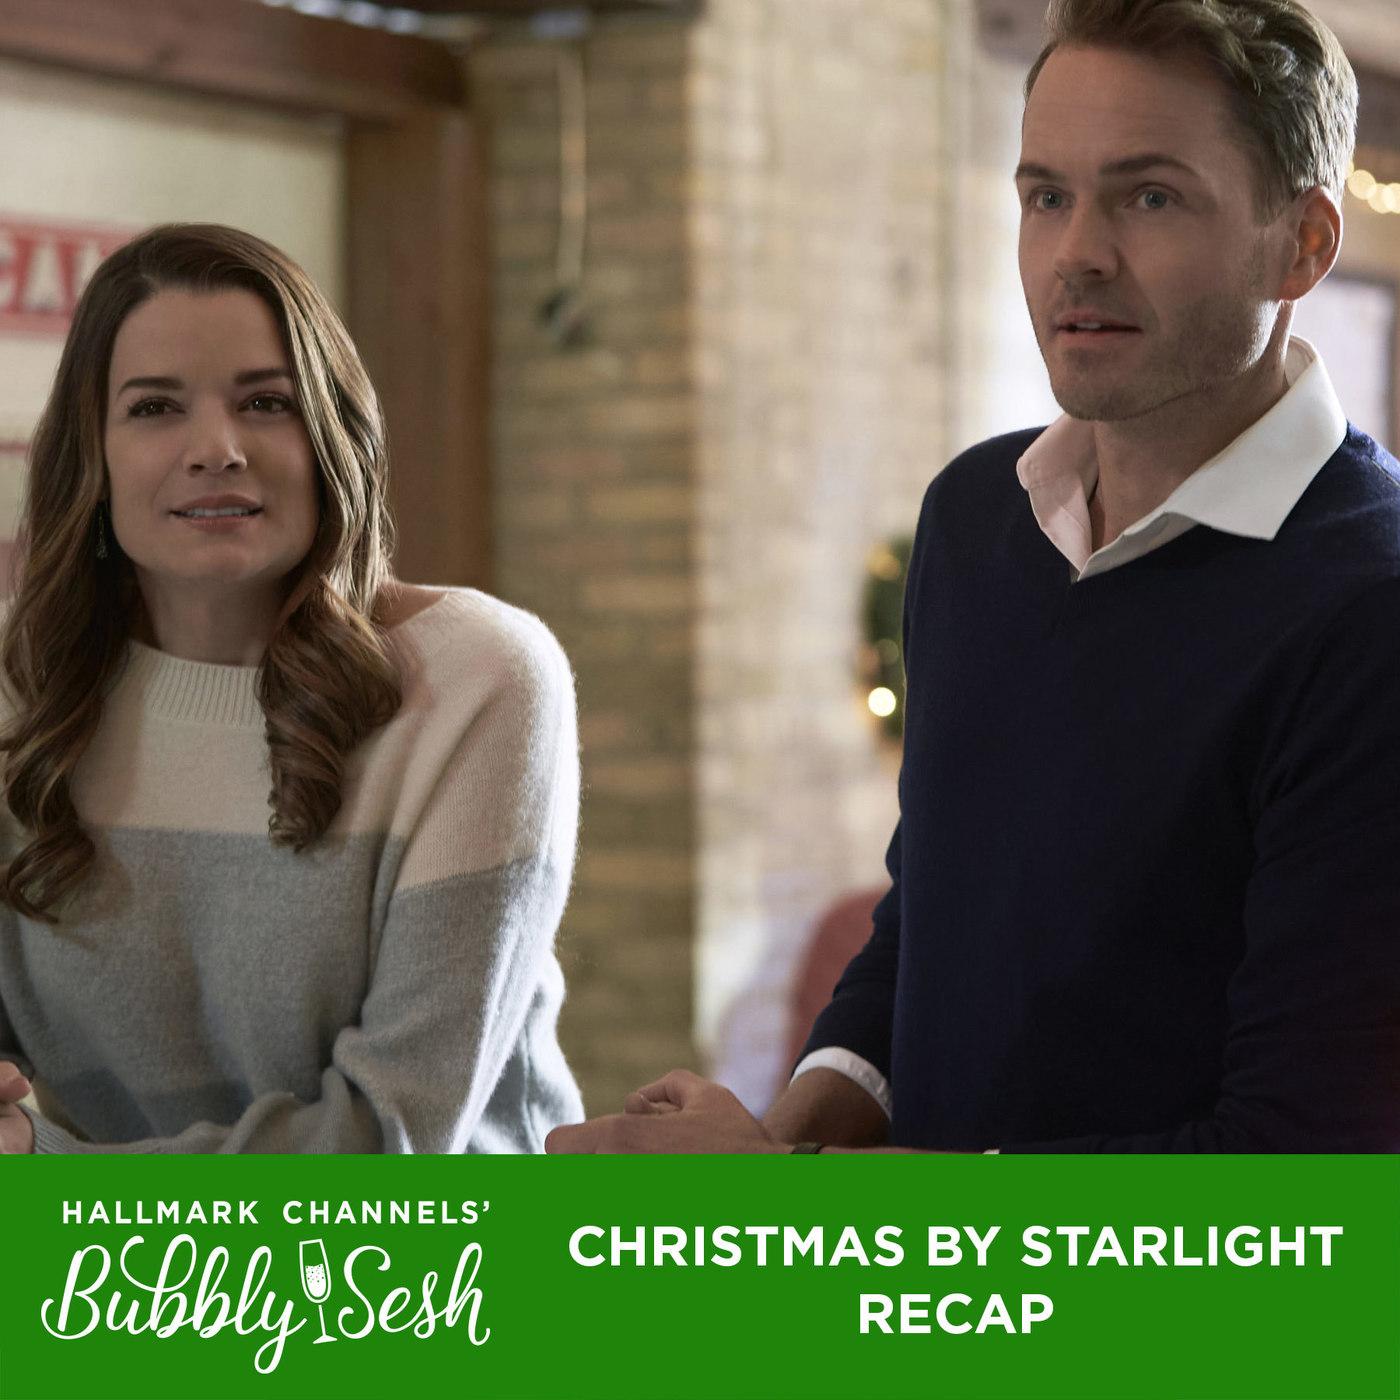 Christmas By Starlight Recap